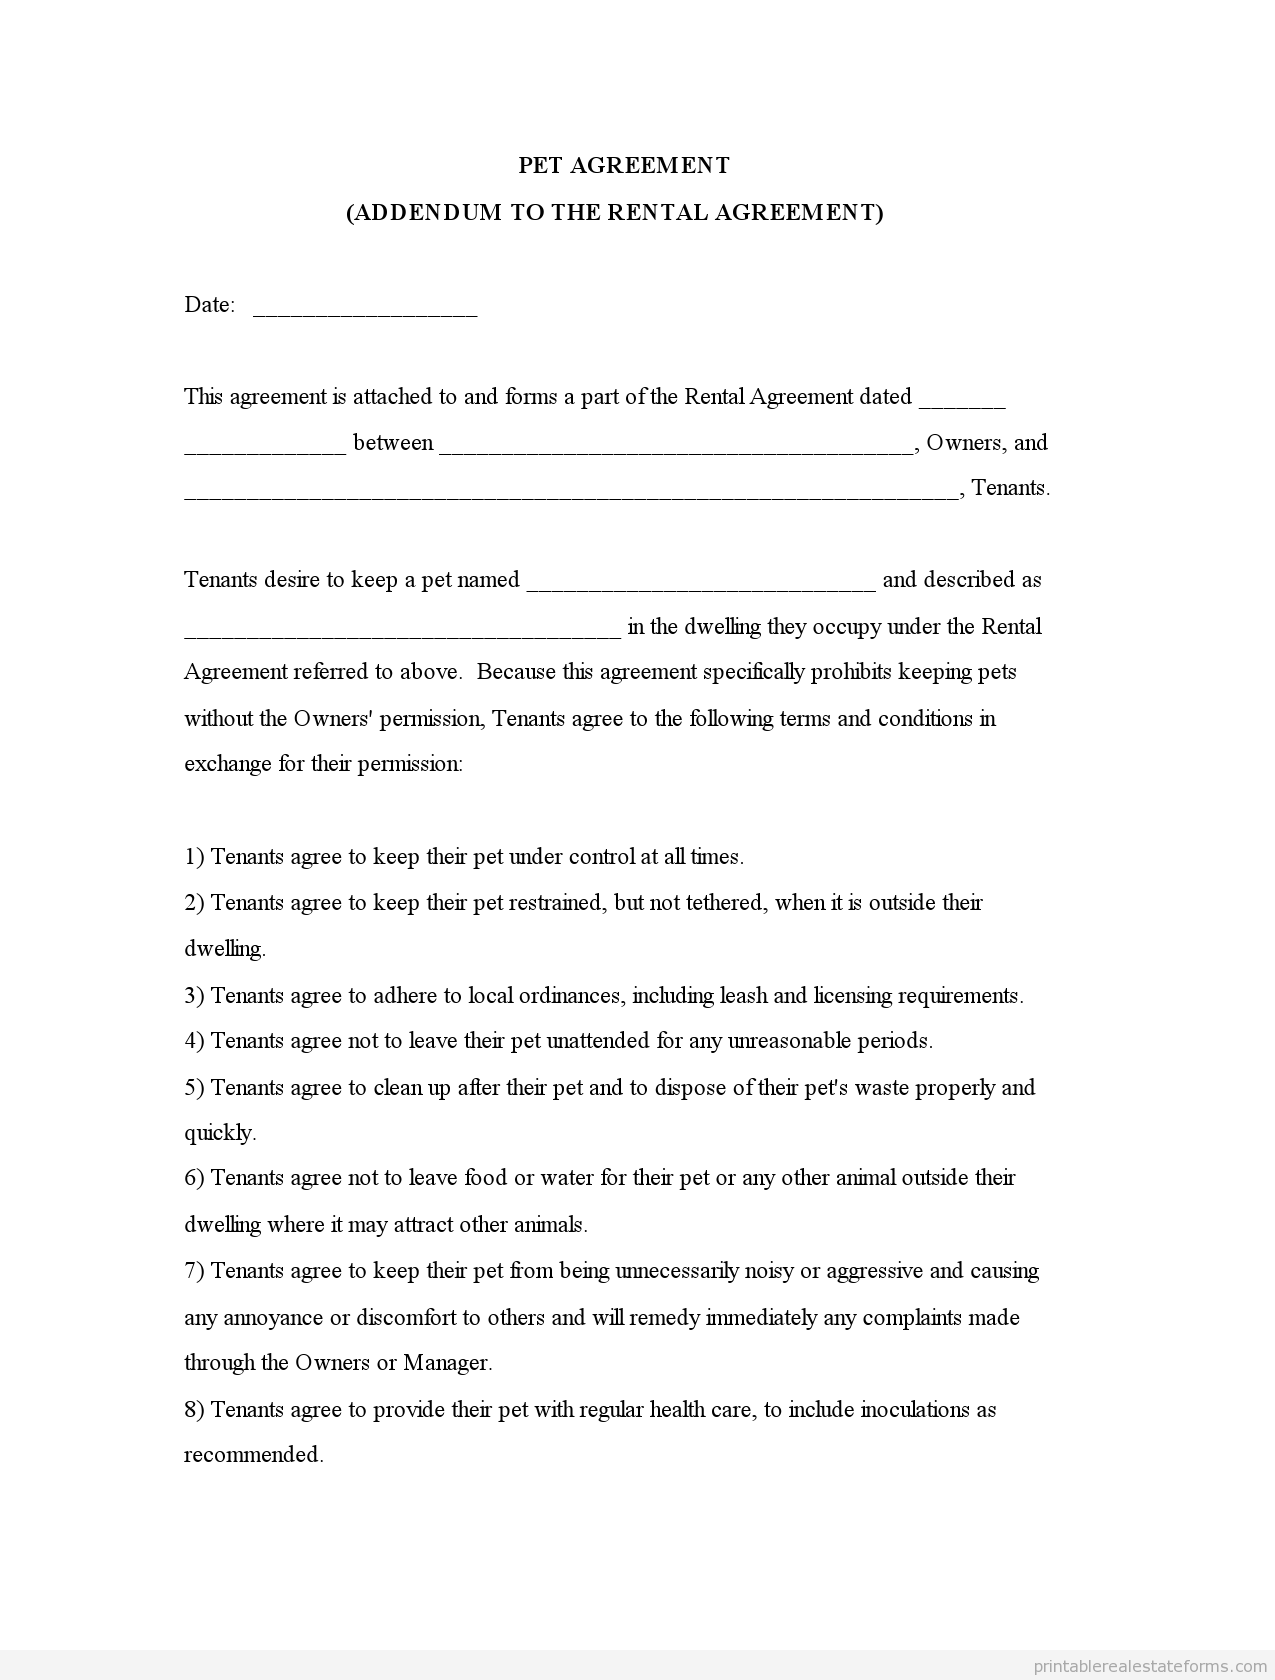 Sample Printable Pet Agreementm Addendum To The Rental